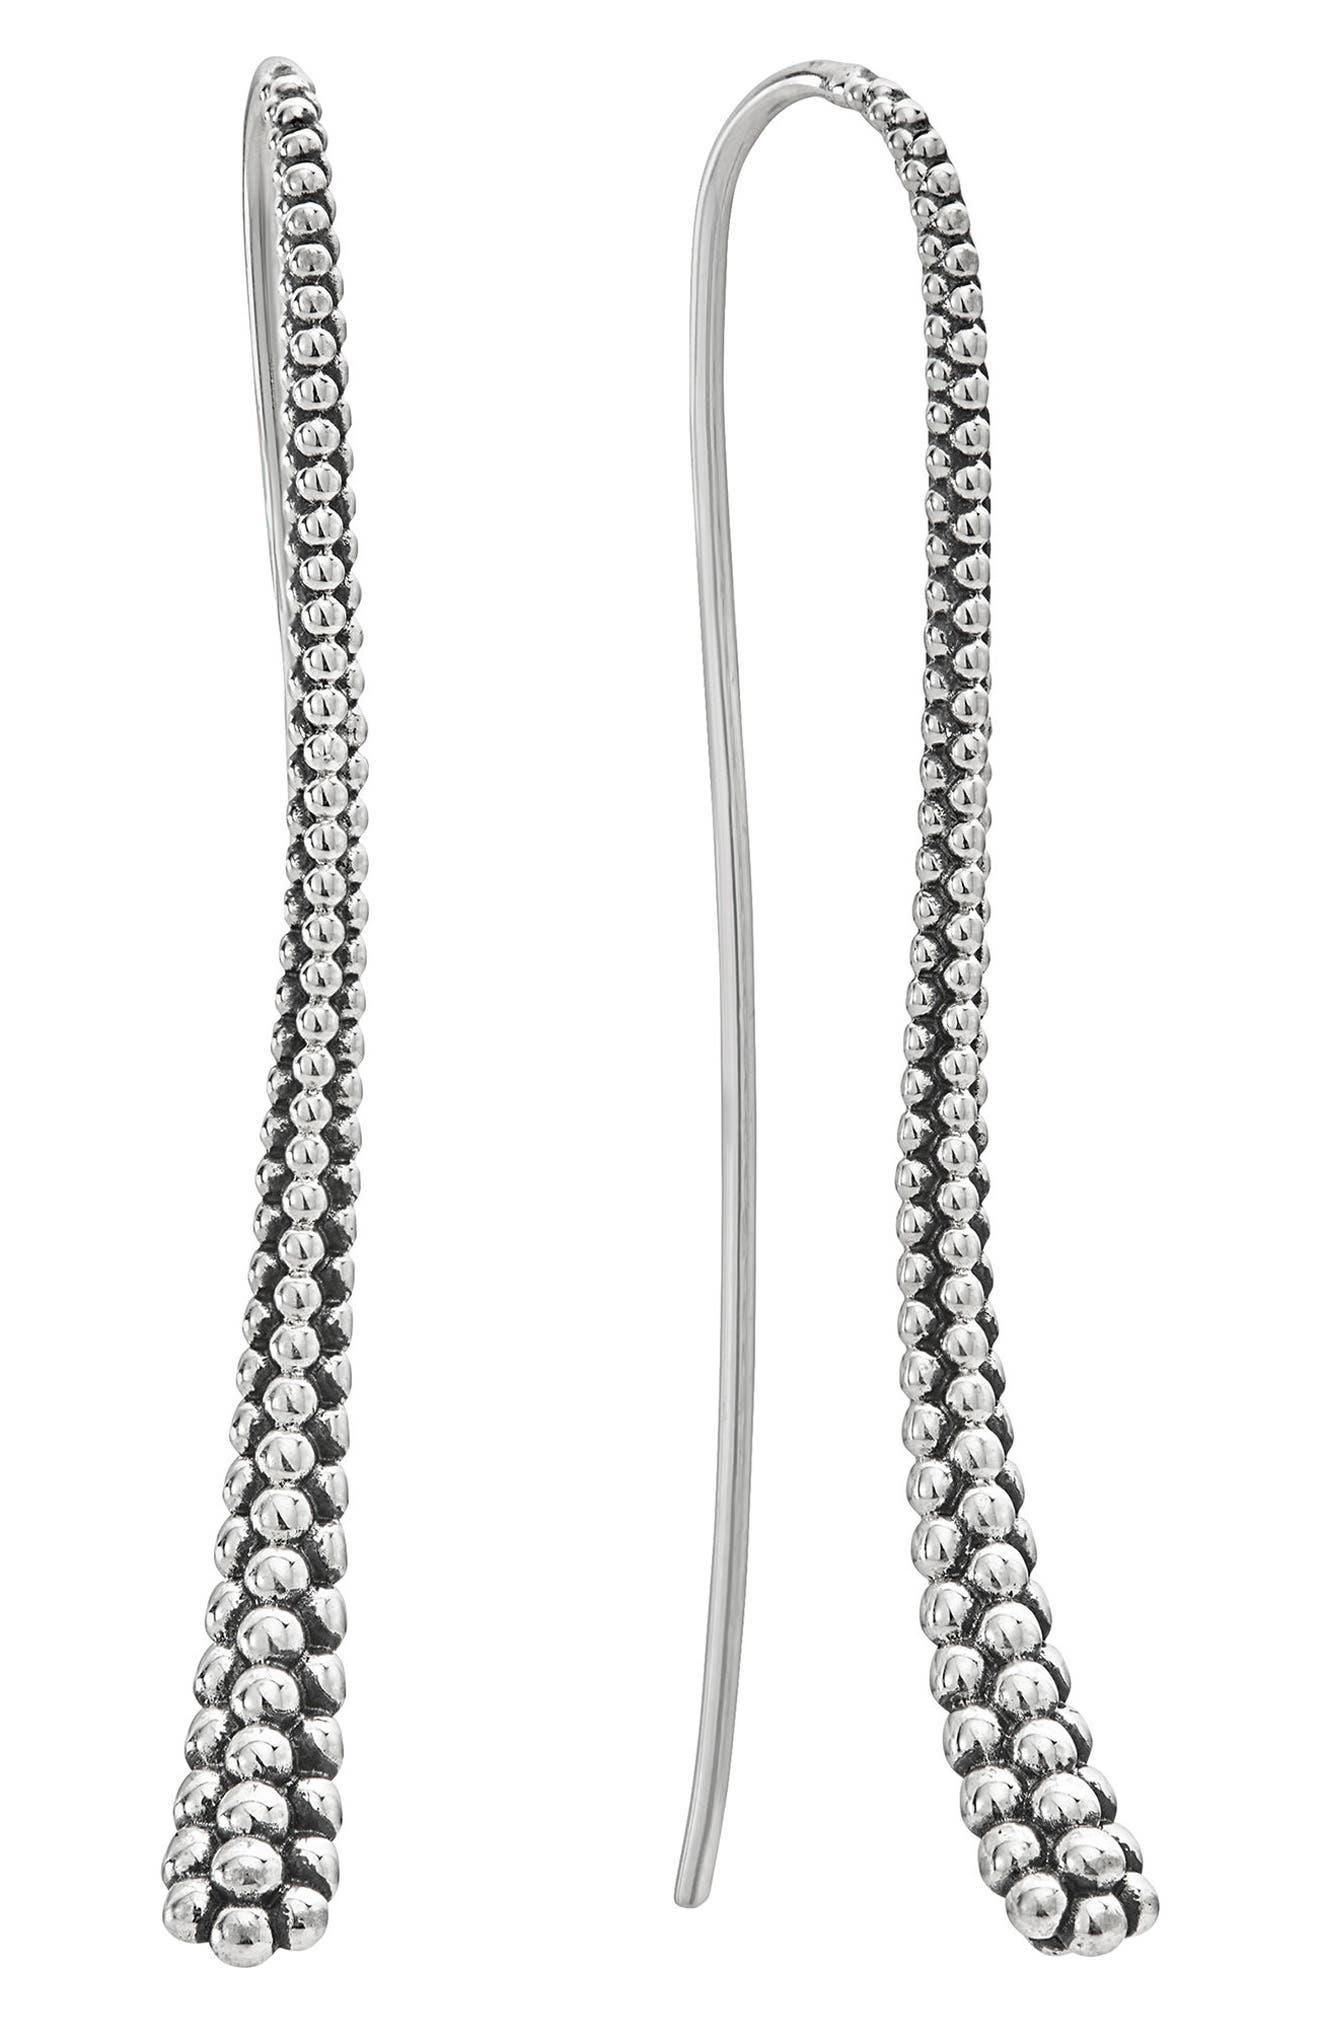 Caviar Linear Earrings,                             Main thumbnail 1, color,                             Silver